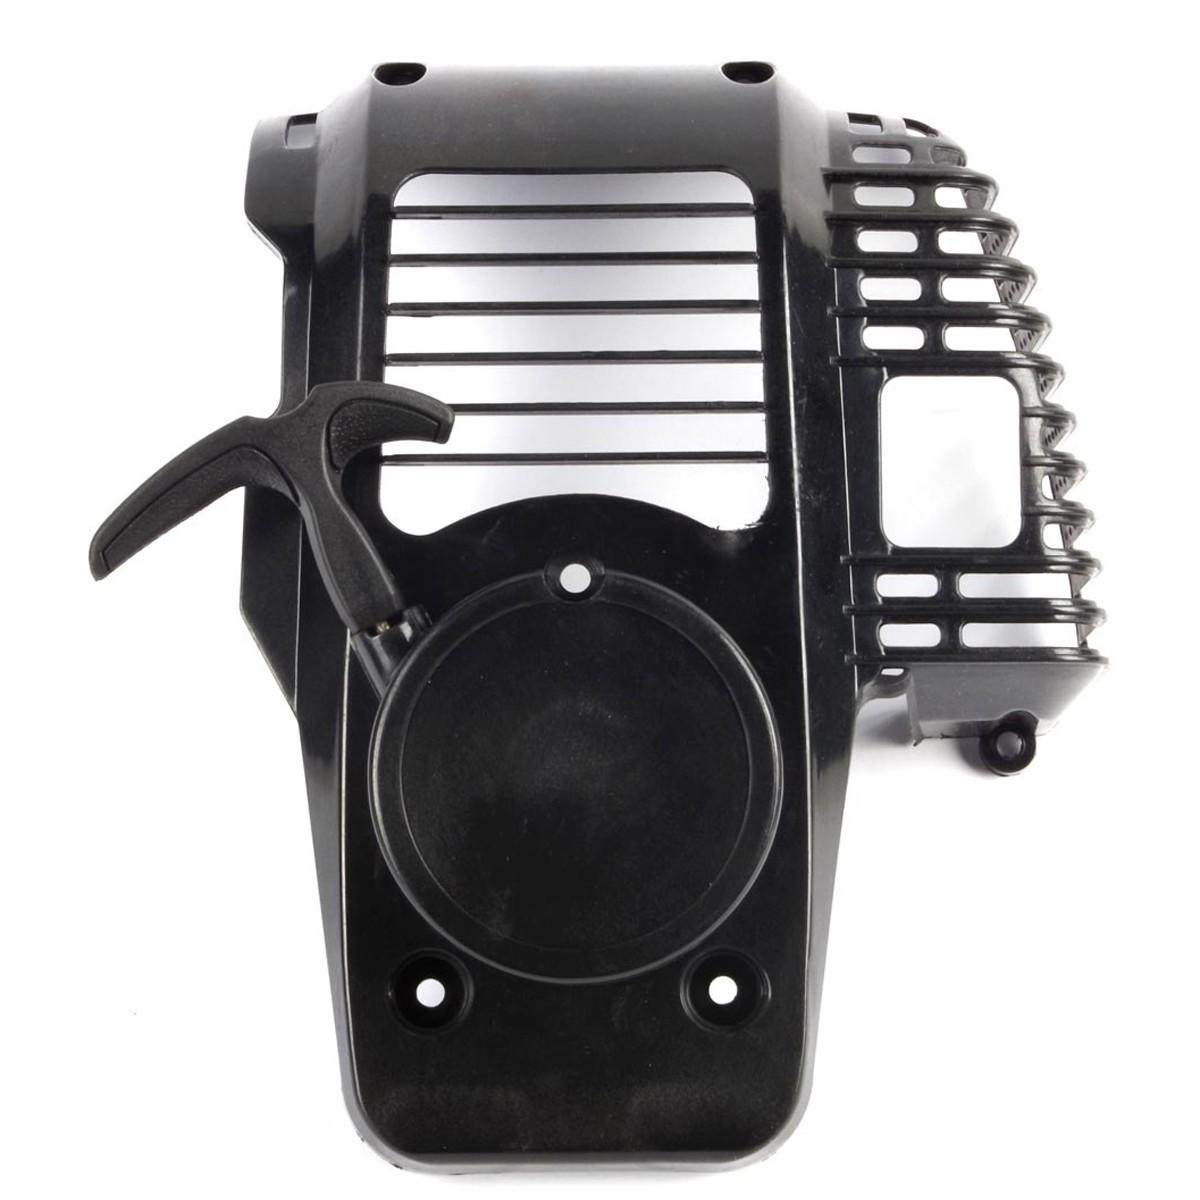 Zündkerze für 4-Takt Motorsense Brast BRB-MT-3805